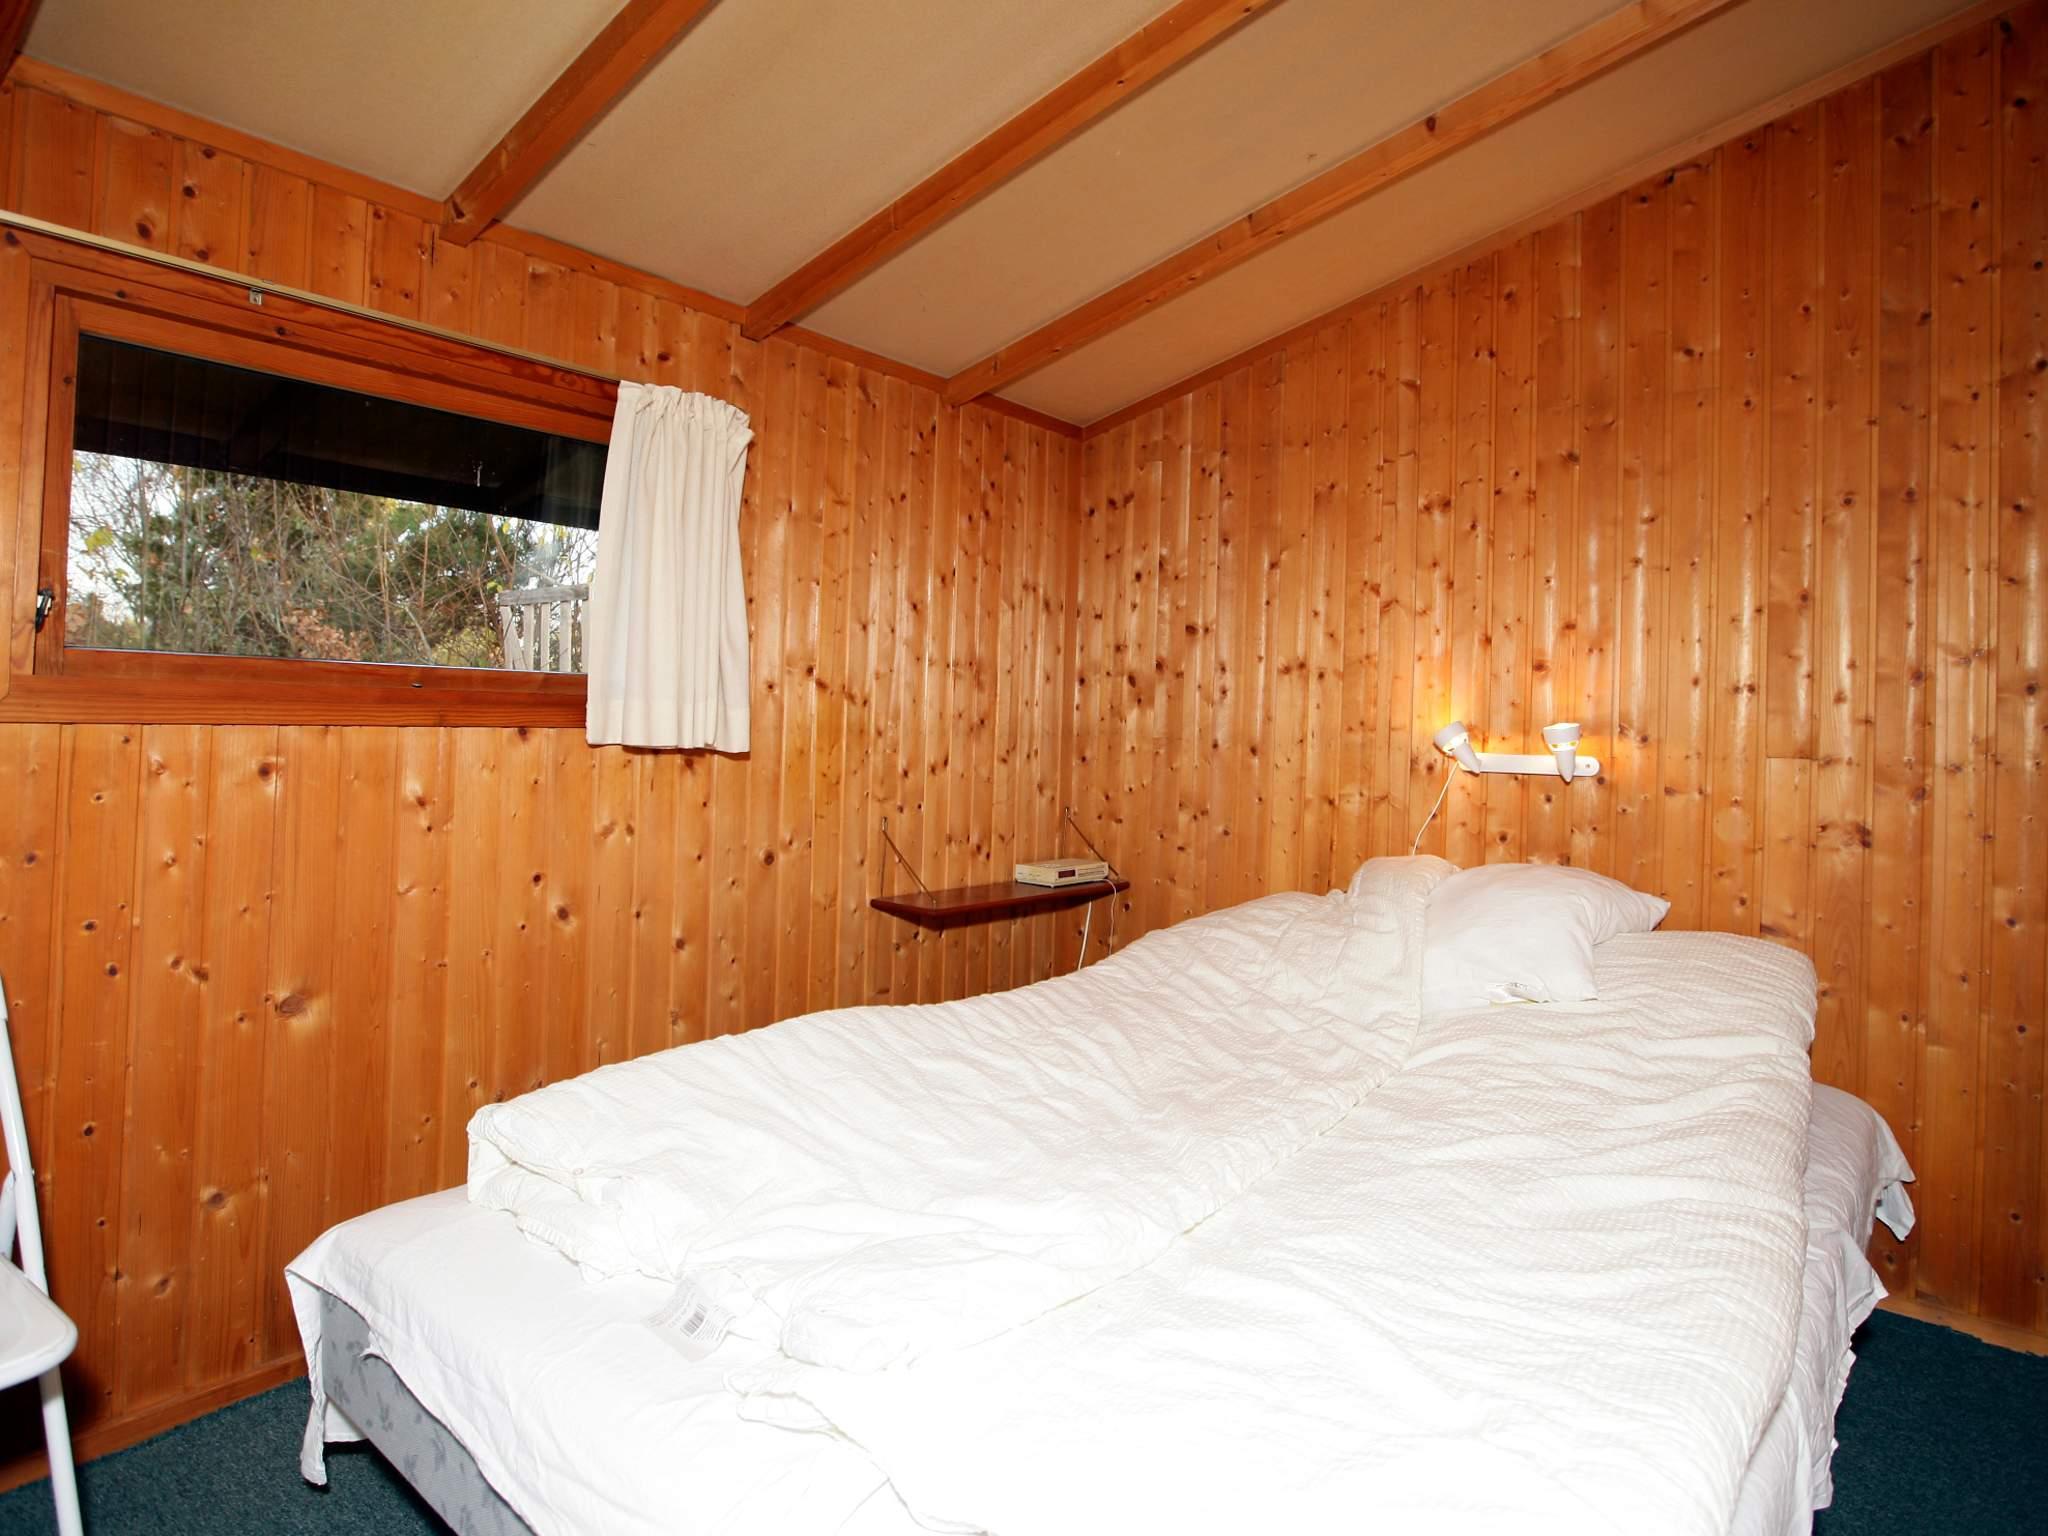 Maison de vacances Hyllingeriis (86362), Skibby, , Seeland Nord, Danemark, image 8